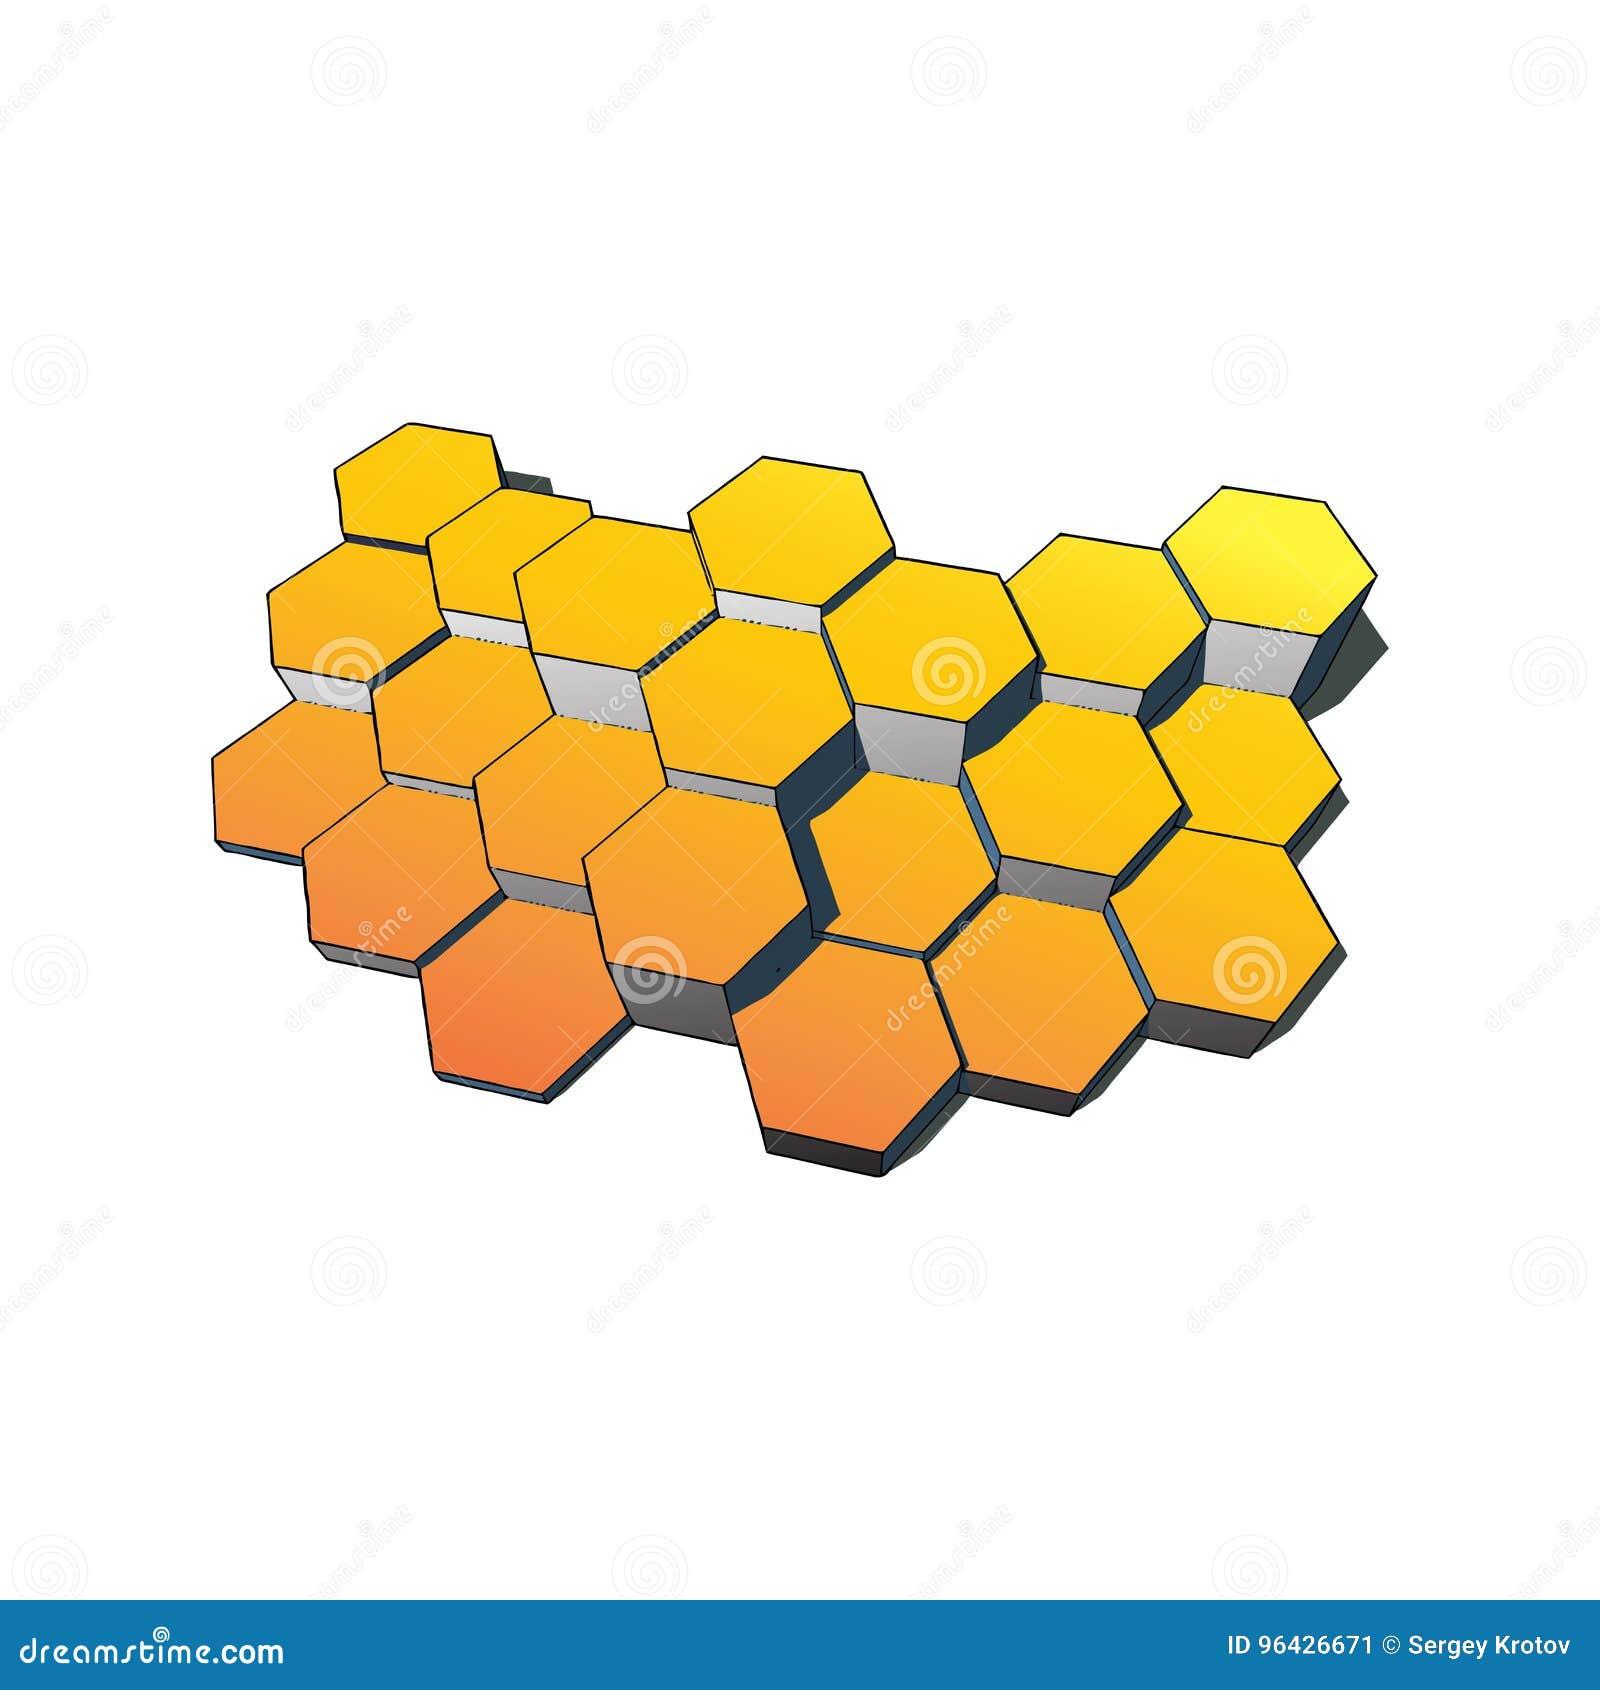 Hexagons τεχνολογία και υπόβαθρο επικοινωνίας Διανυσματική απεικόνιση EPS10